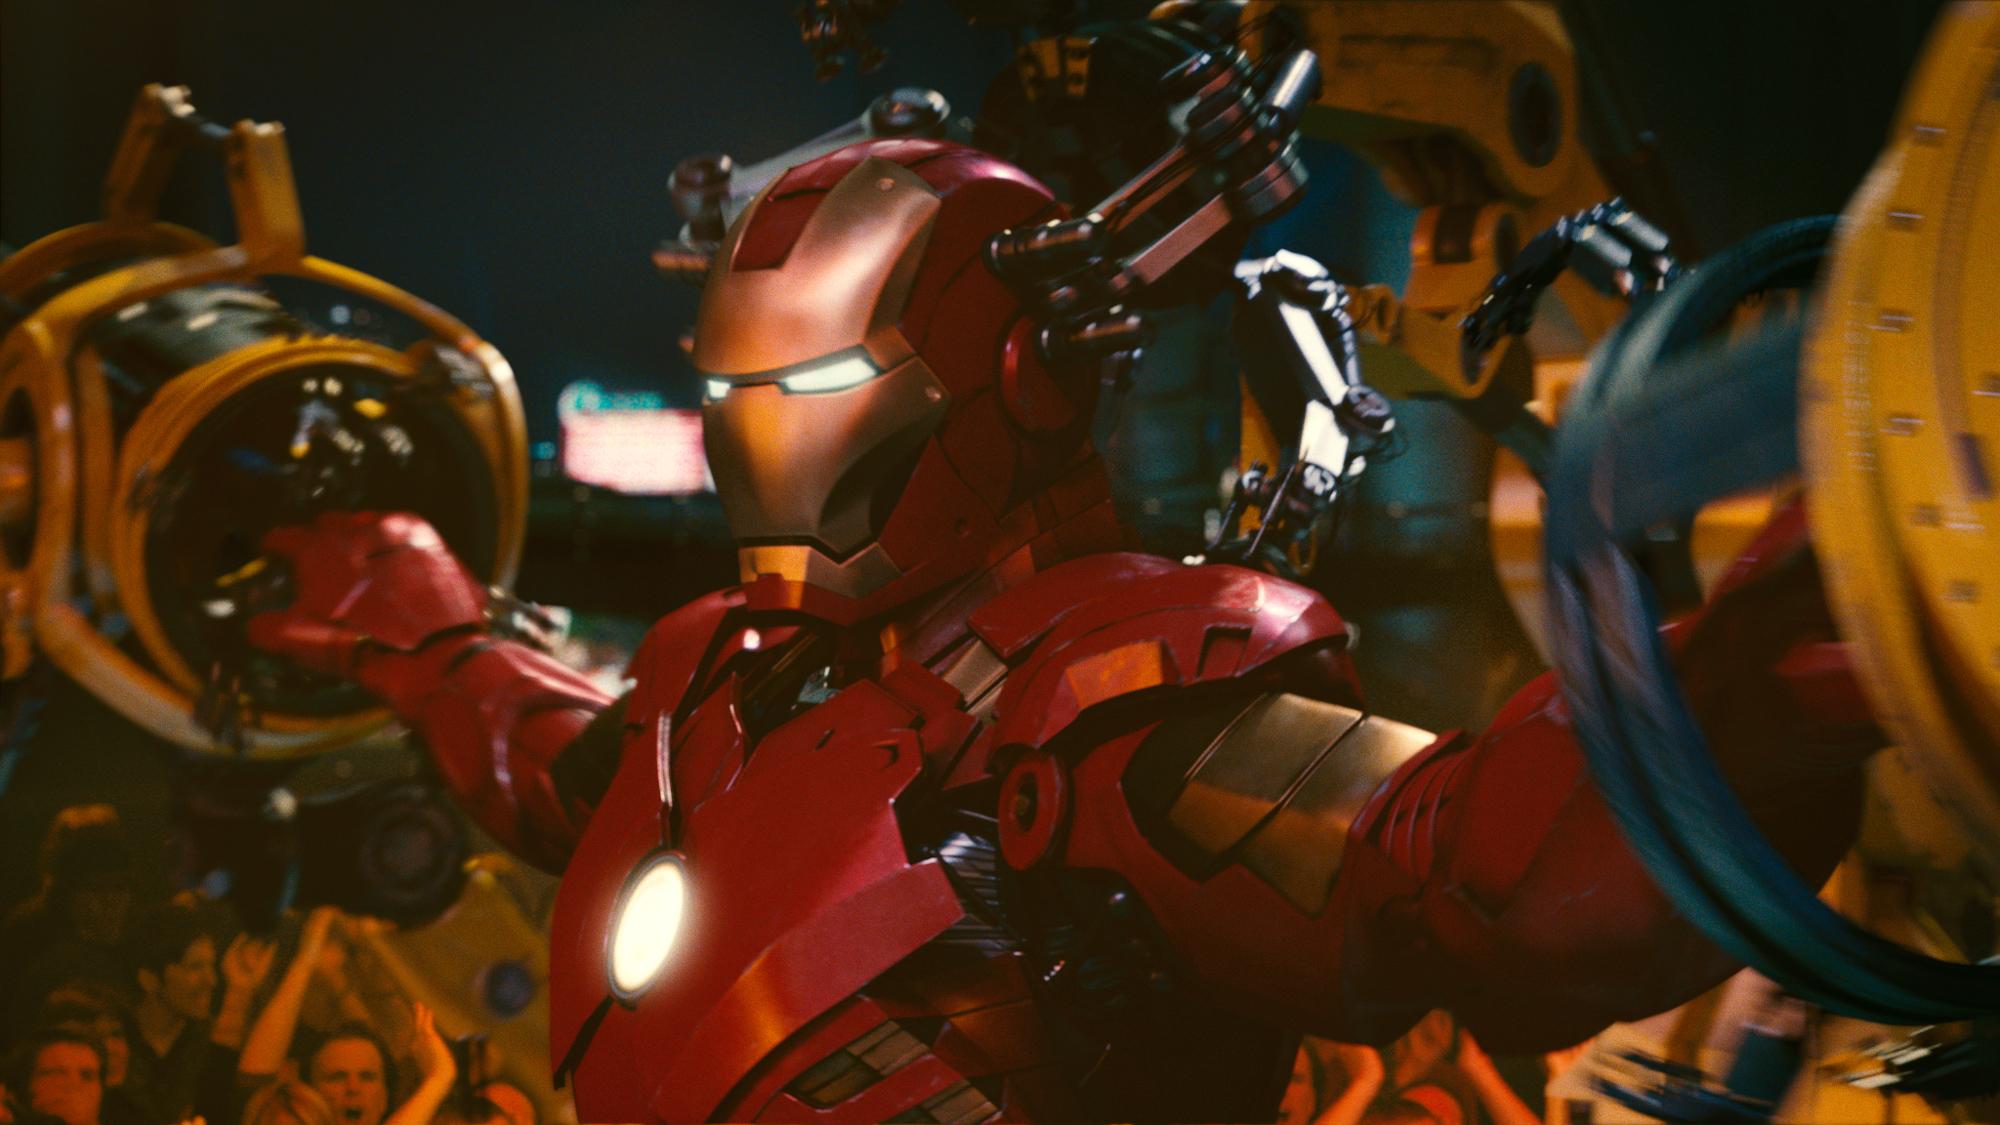 Better Film: Iron-Man 2 or Aquaman? - Gen. Discussion